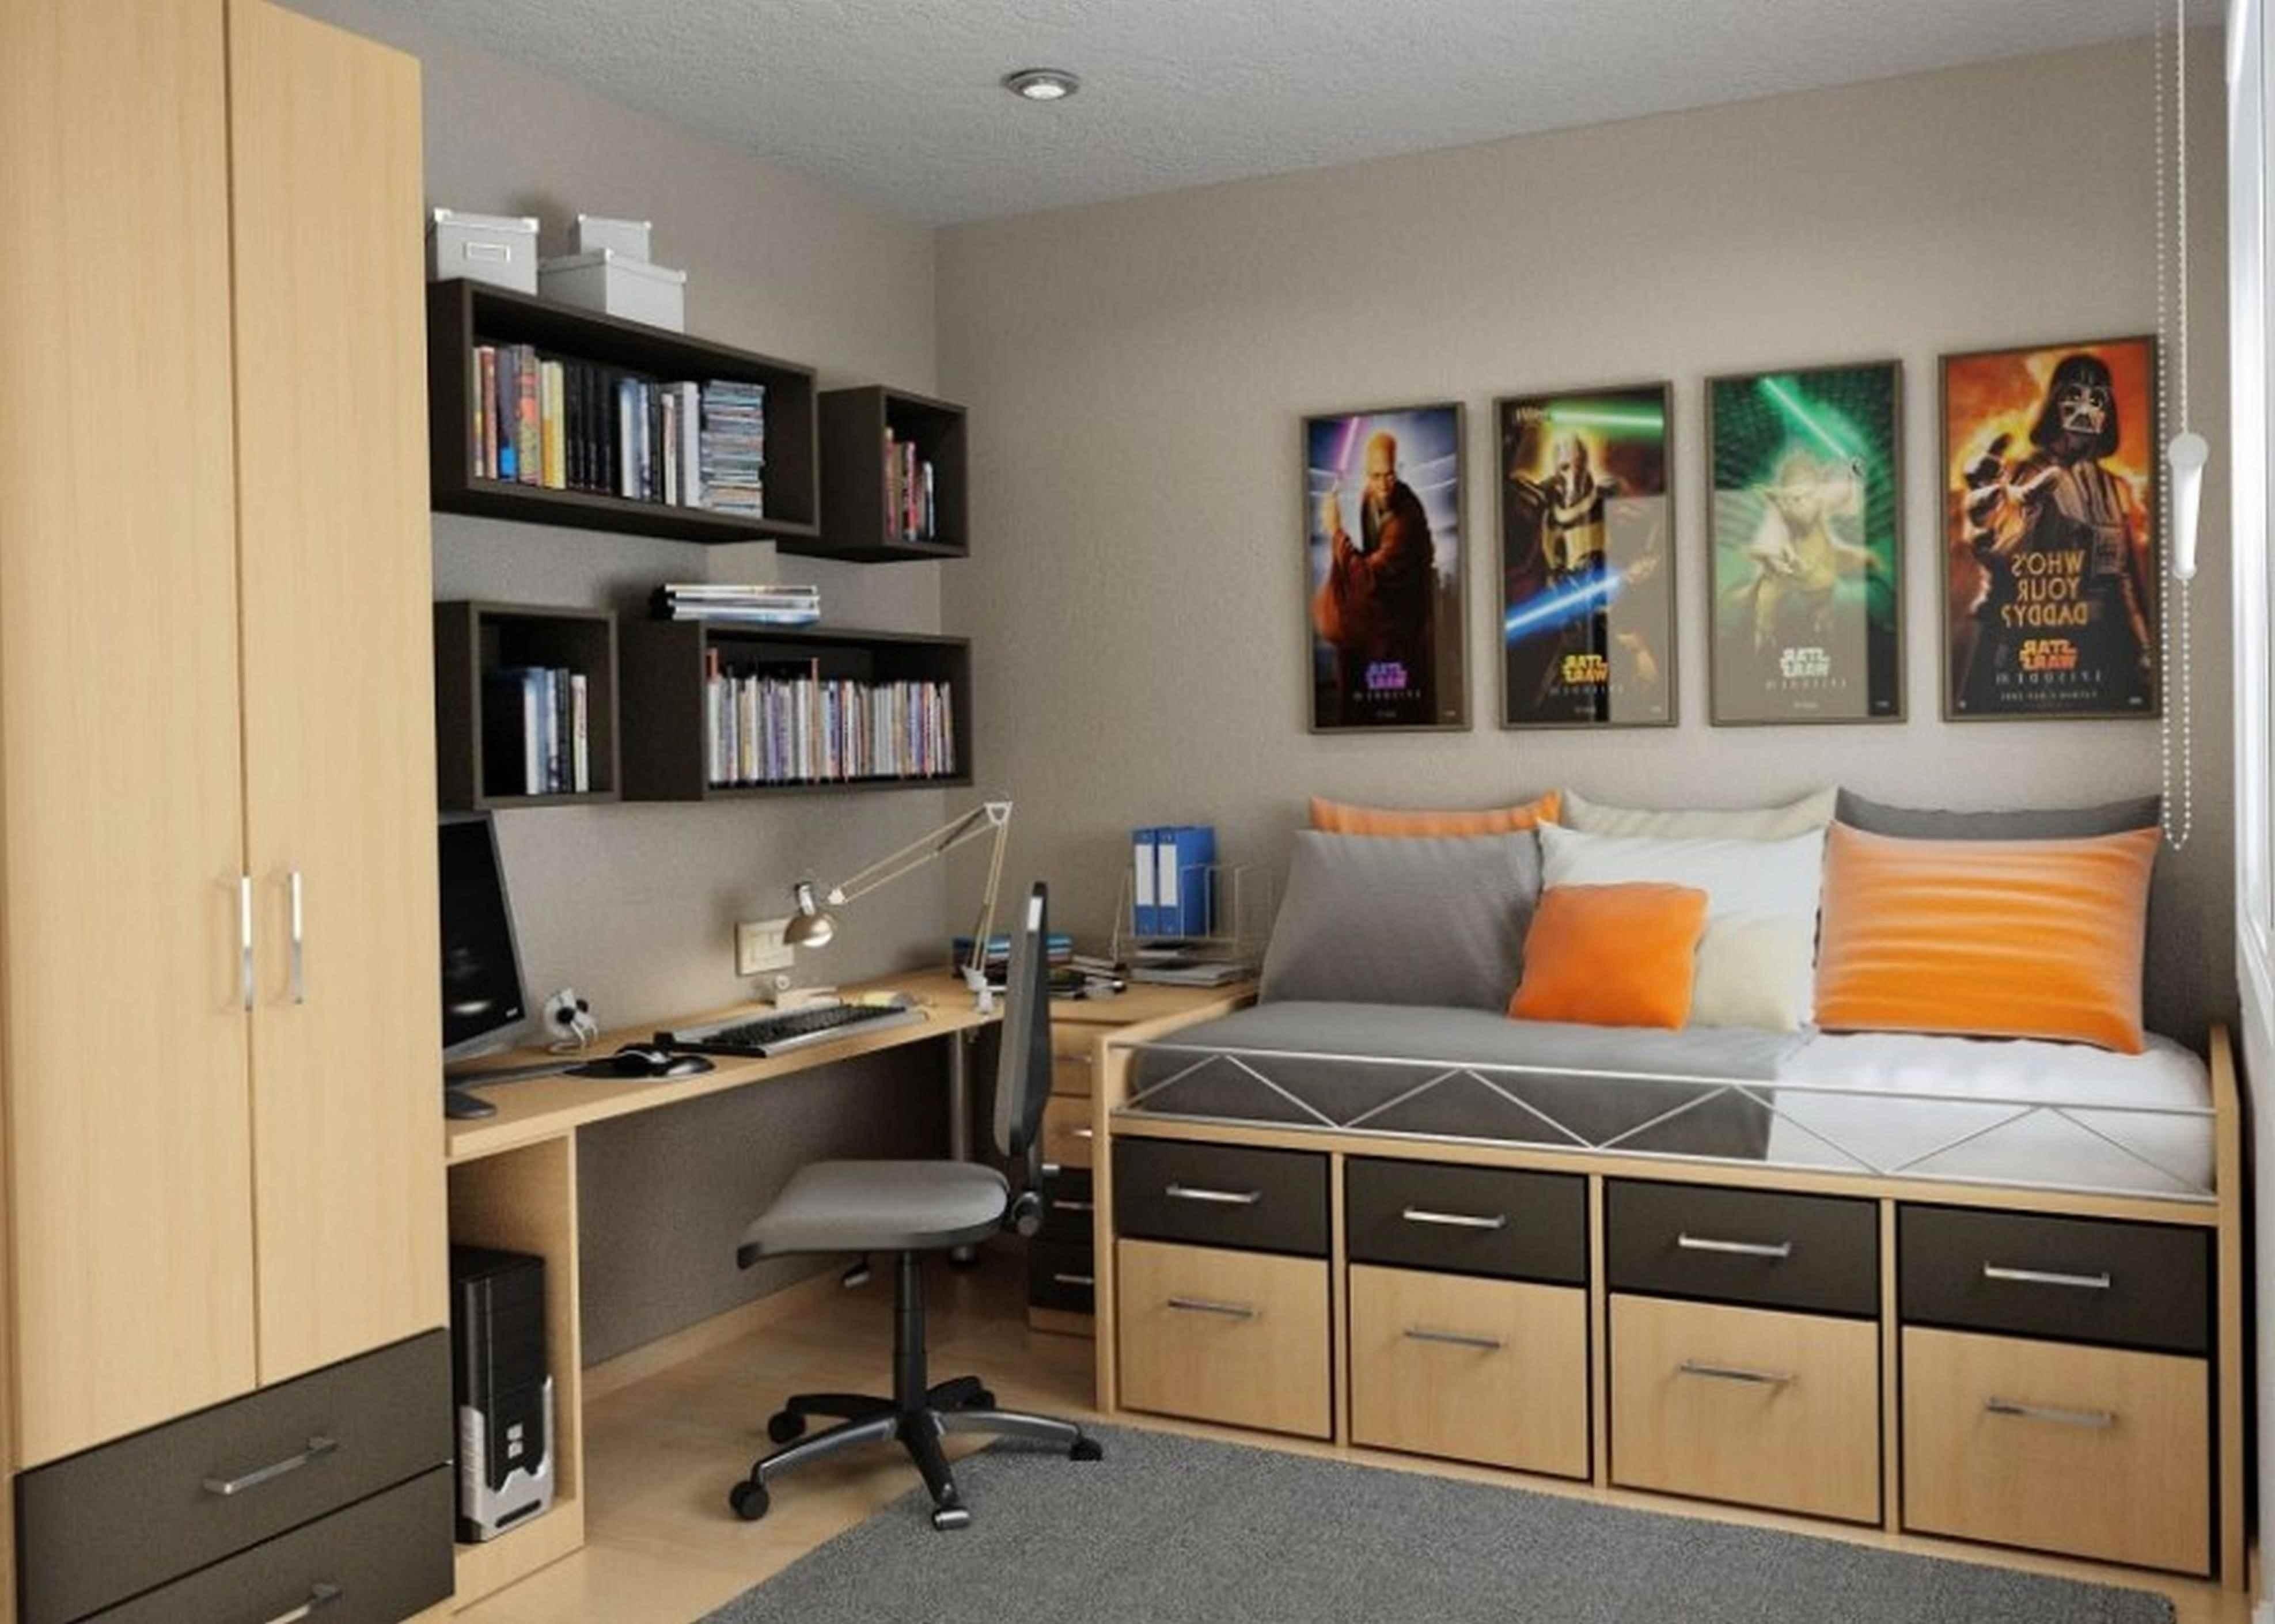 10 Fashionable Cool Bedroom Ideas For Teenage Guys bedroom ideas teenage guys lovely bedroom bedroom design cool ideas 1 2020